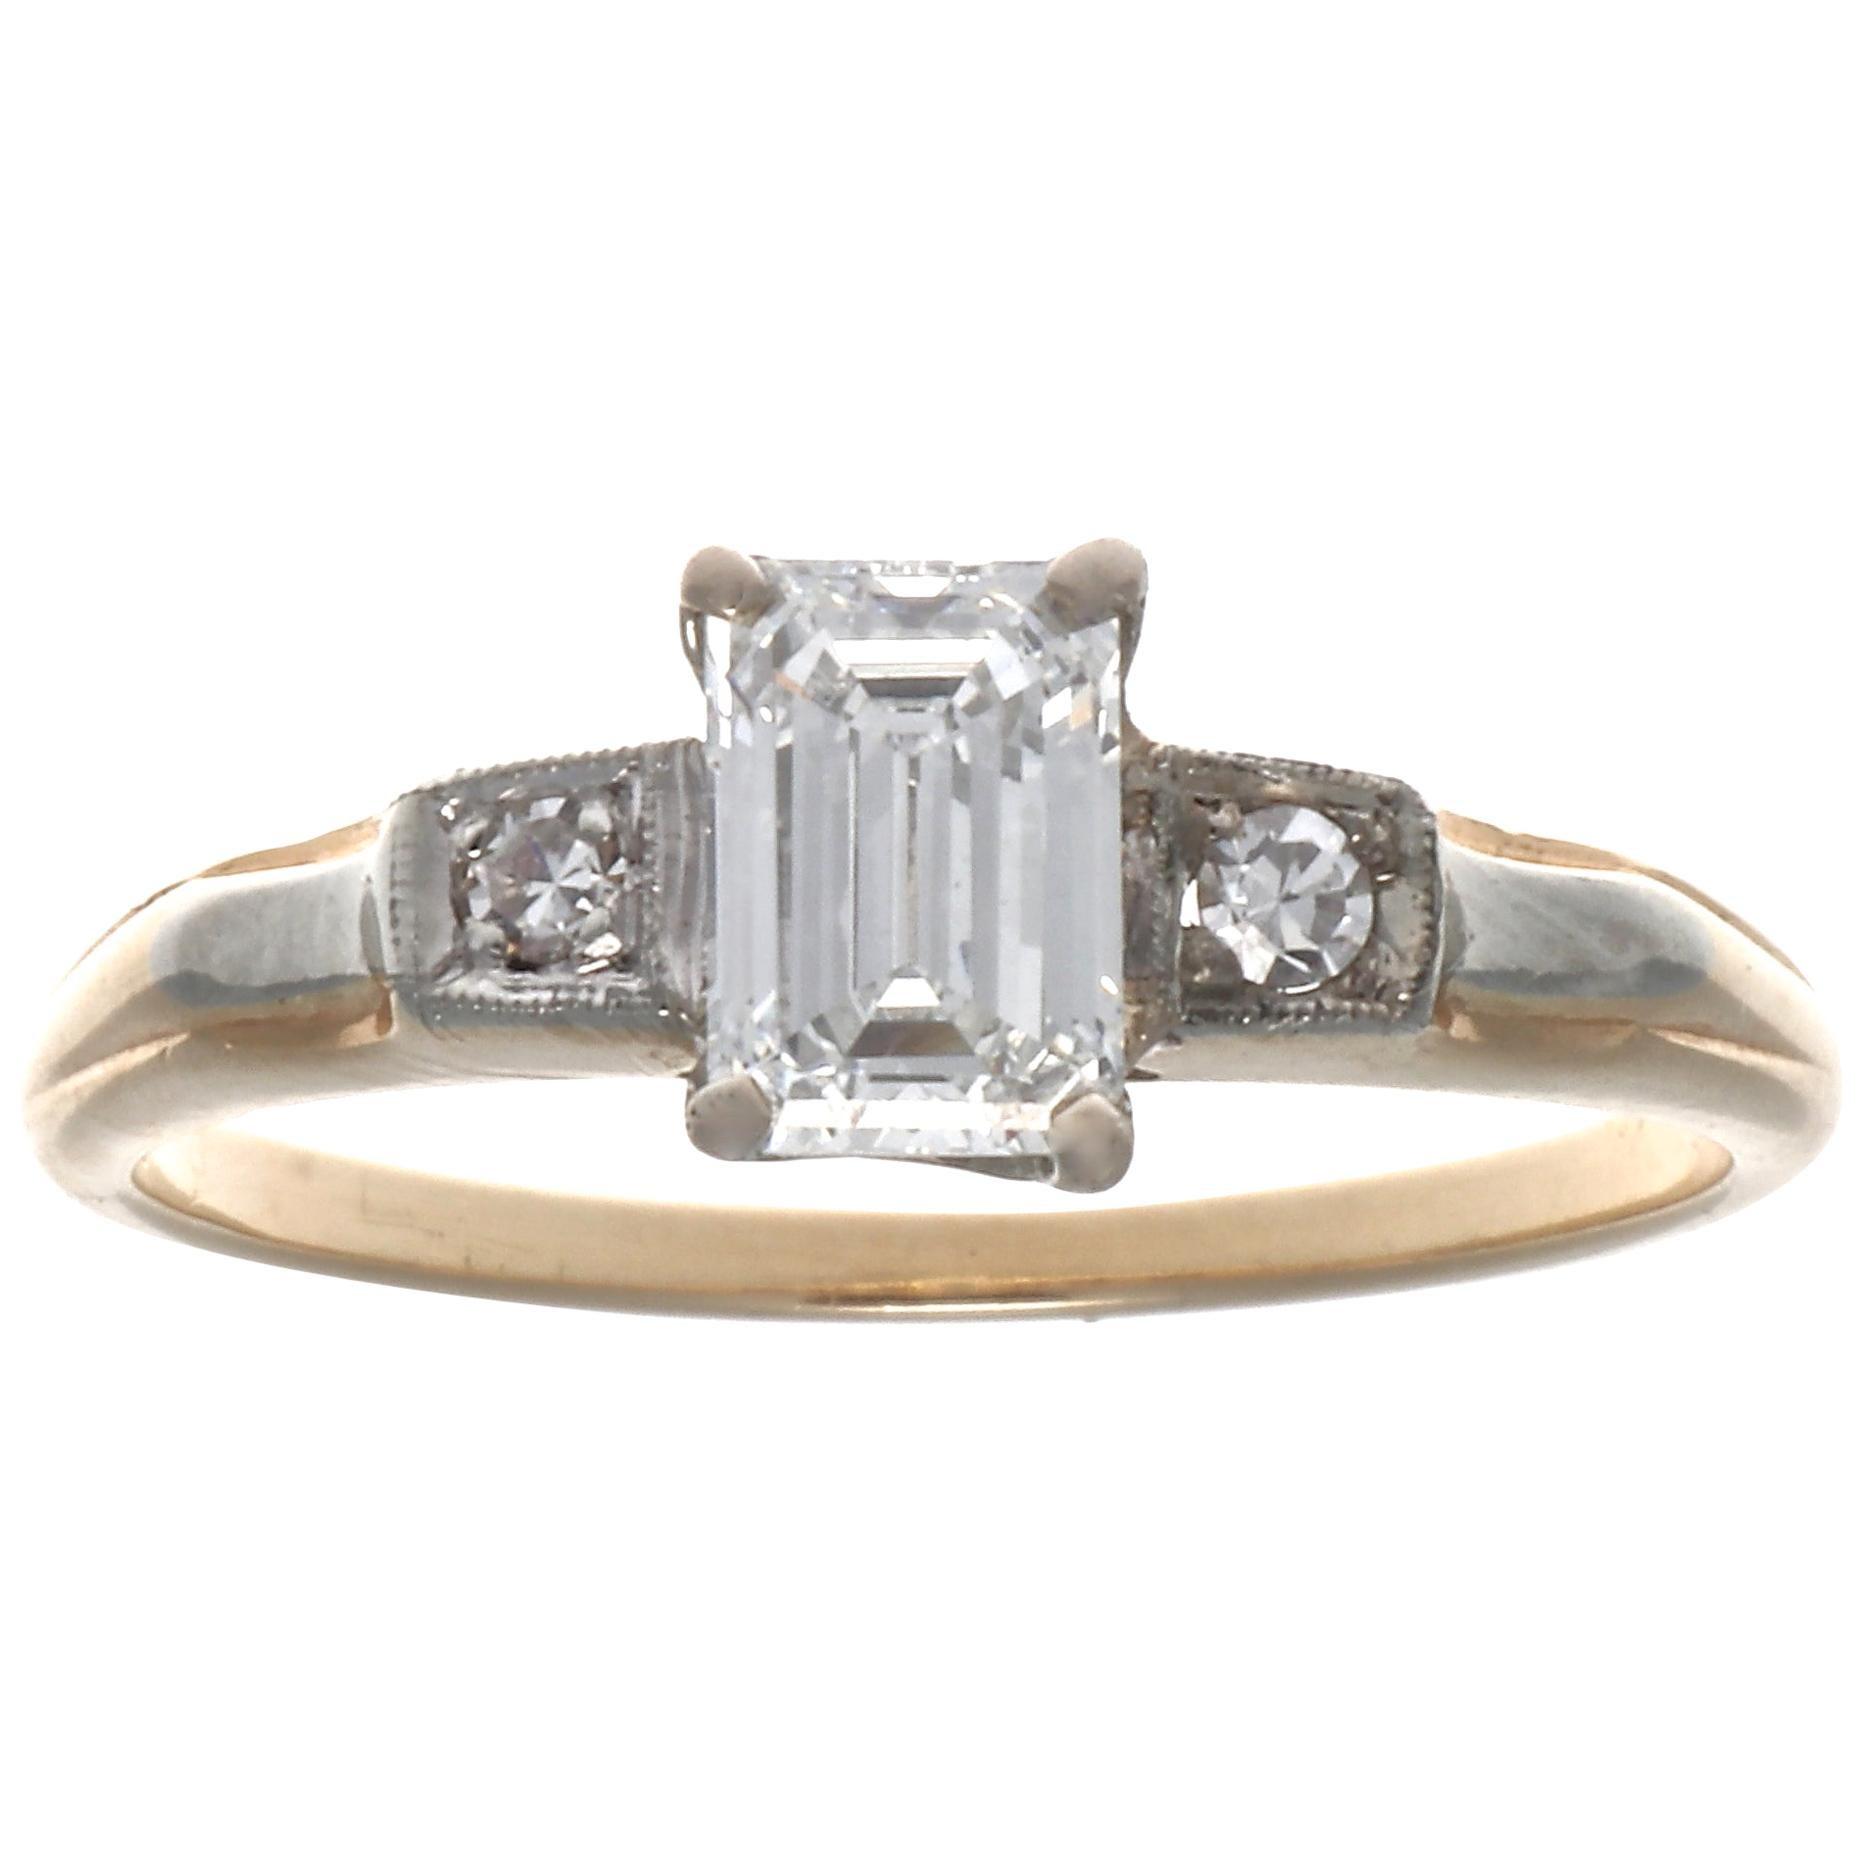 Retro GIA Emerald Cut Diamond Gold Engagement Ring